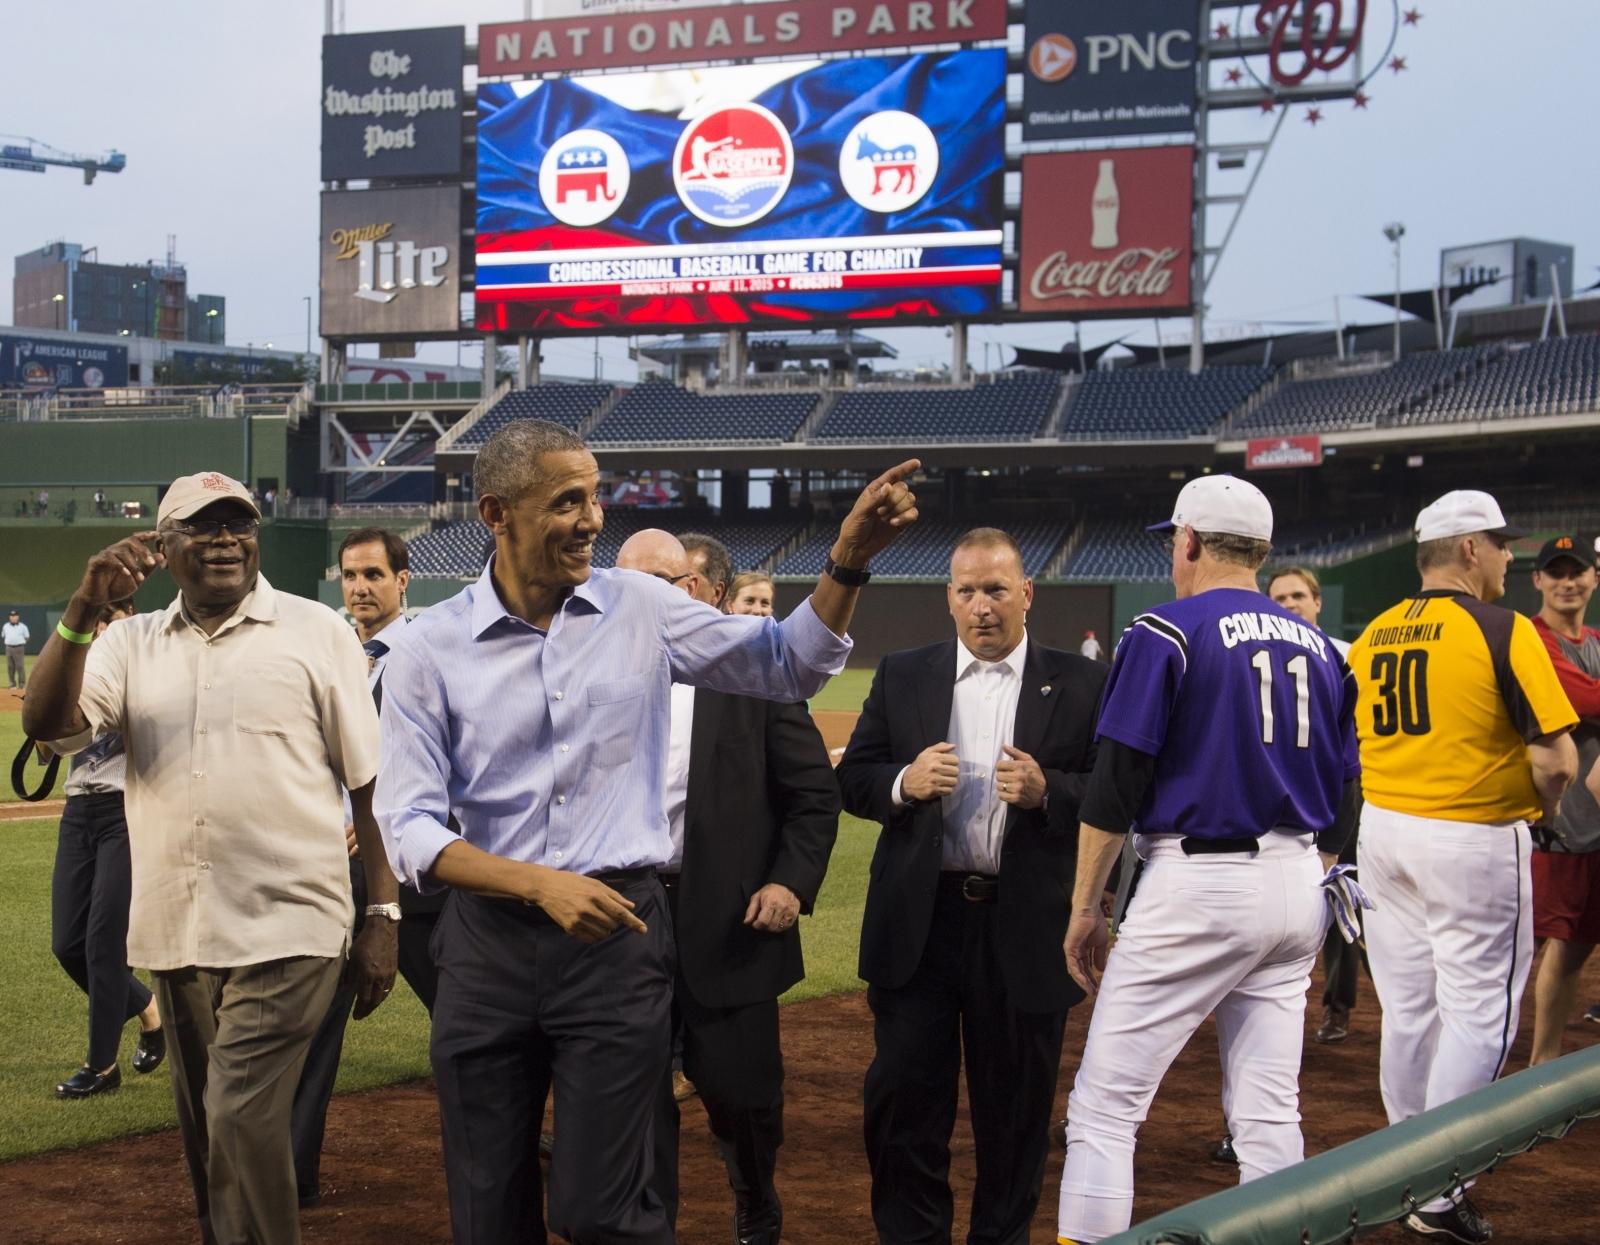 Obama at Congressional Baseball Game